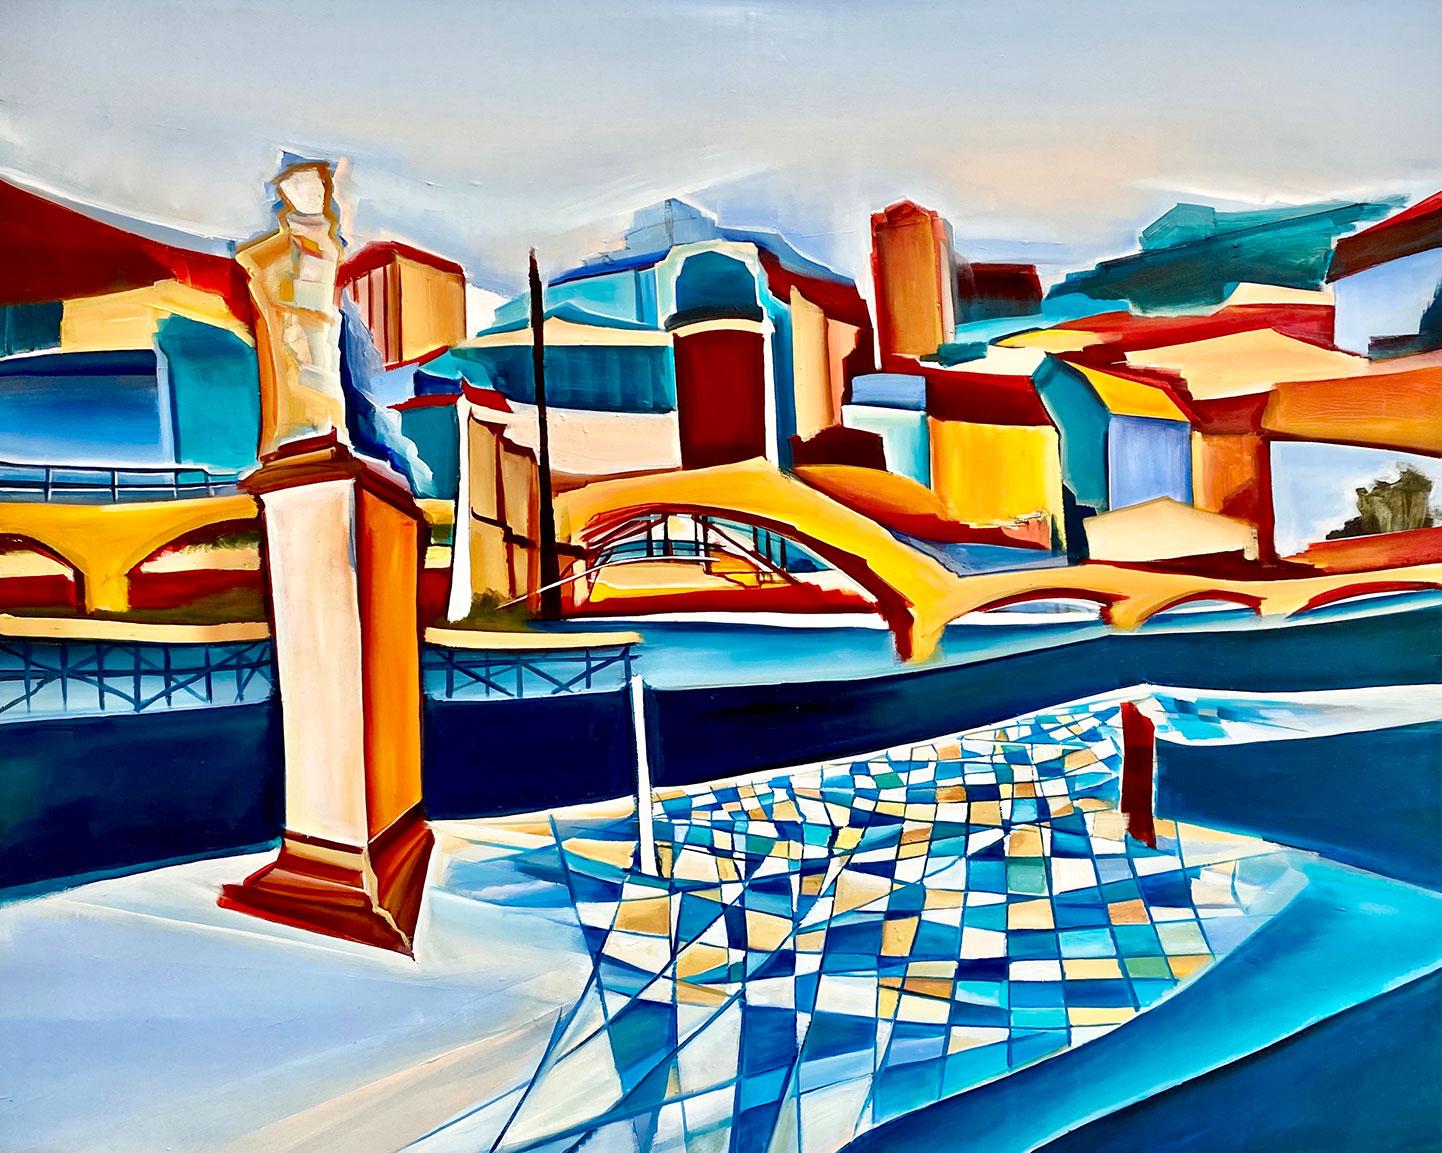 Christin Lutze: Bild 'Brücke in Heidelberg' (2020) (Original / Unikat), auf Keilrahmen